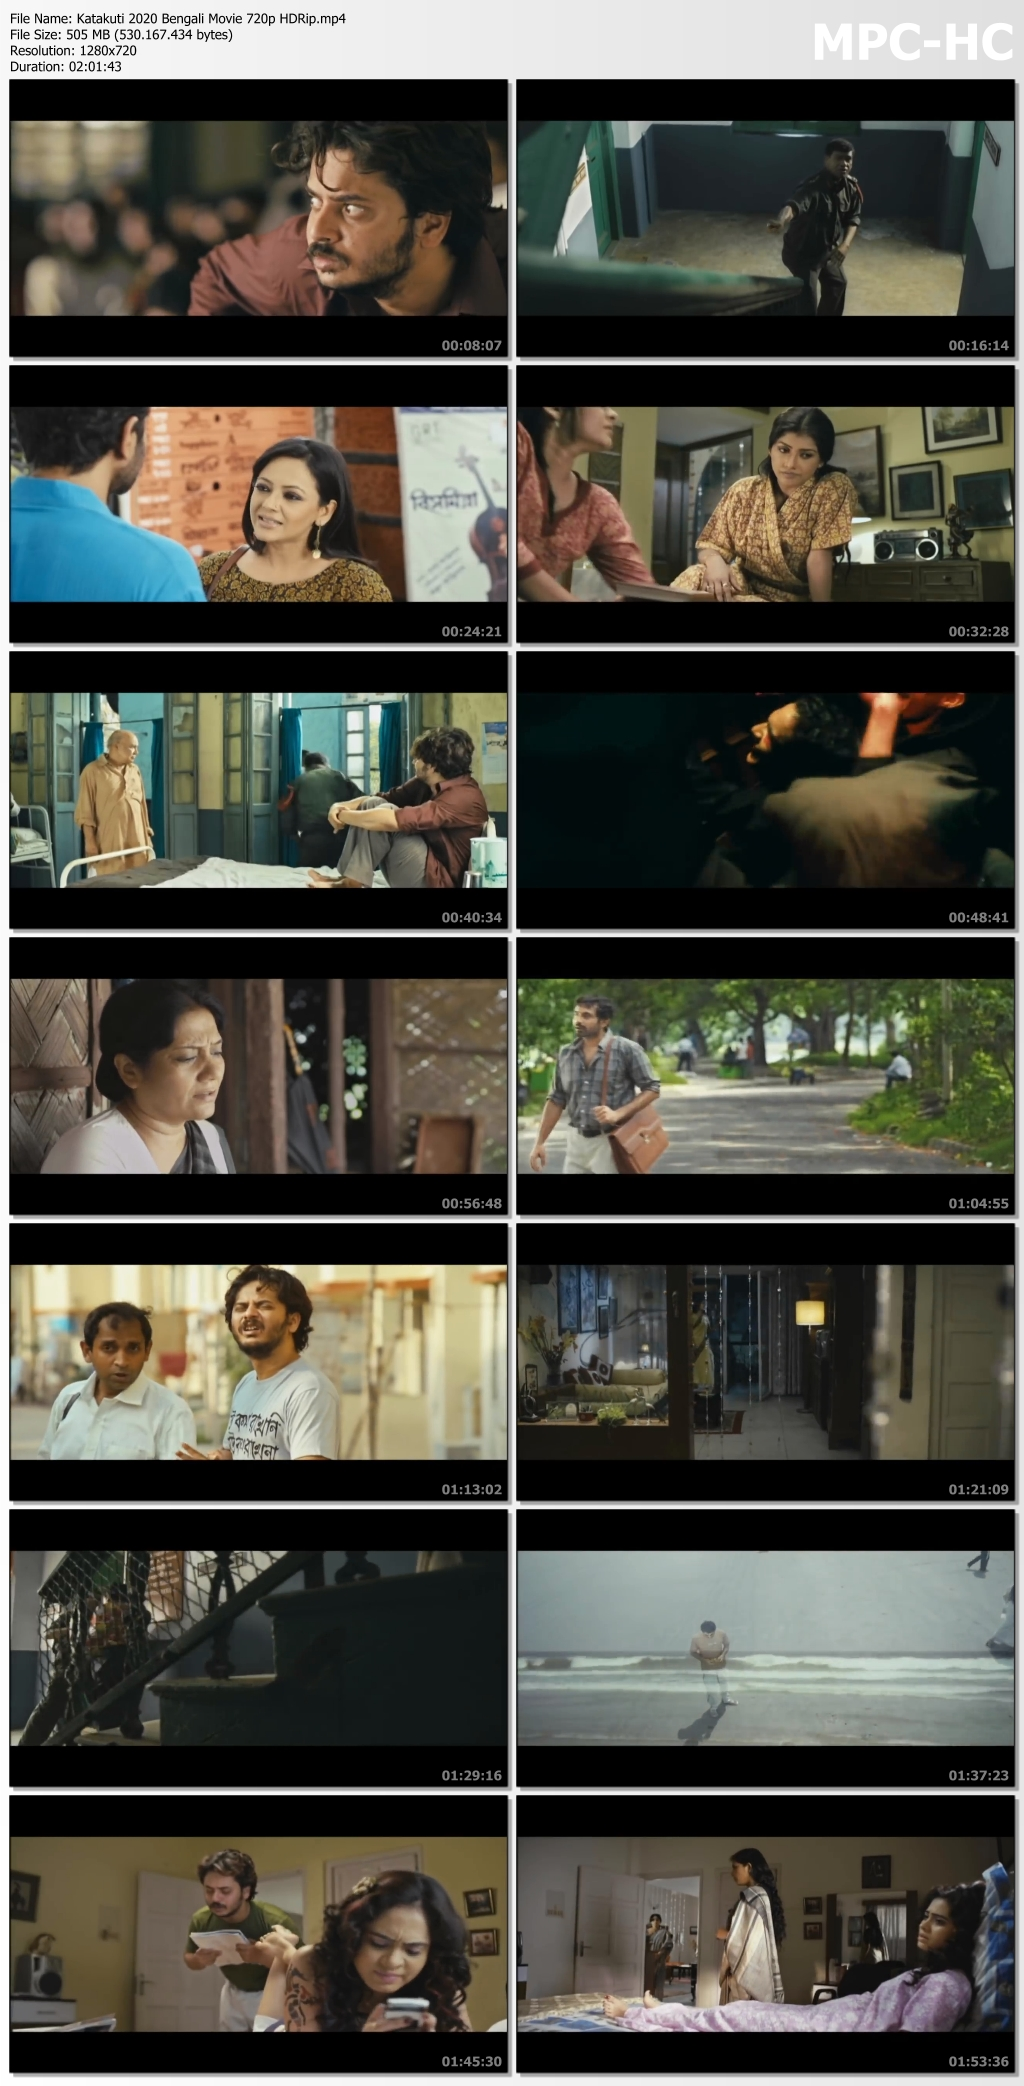 Katakuti-2020-Bengali-Movie-720p-HDRip-mp4-thumbs